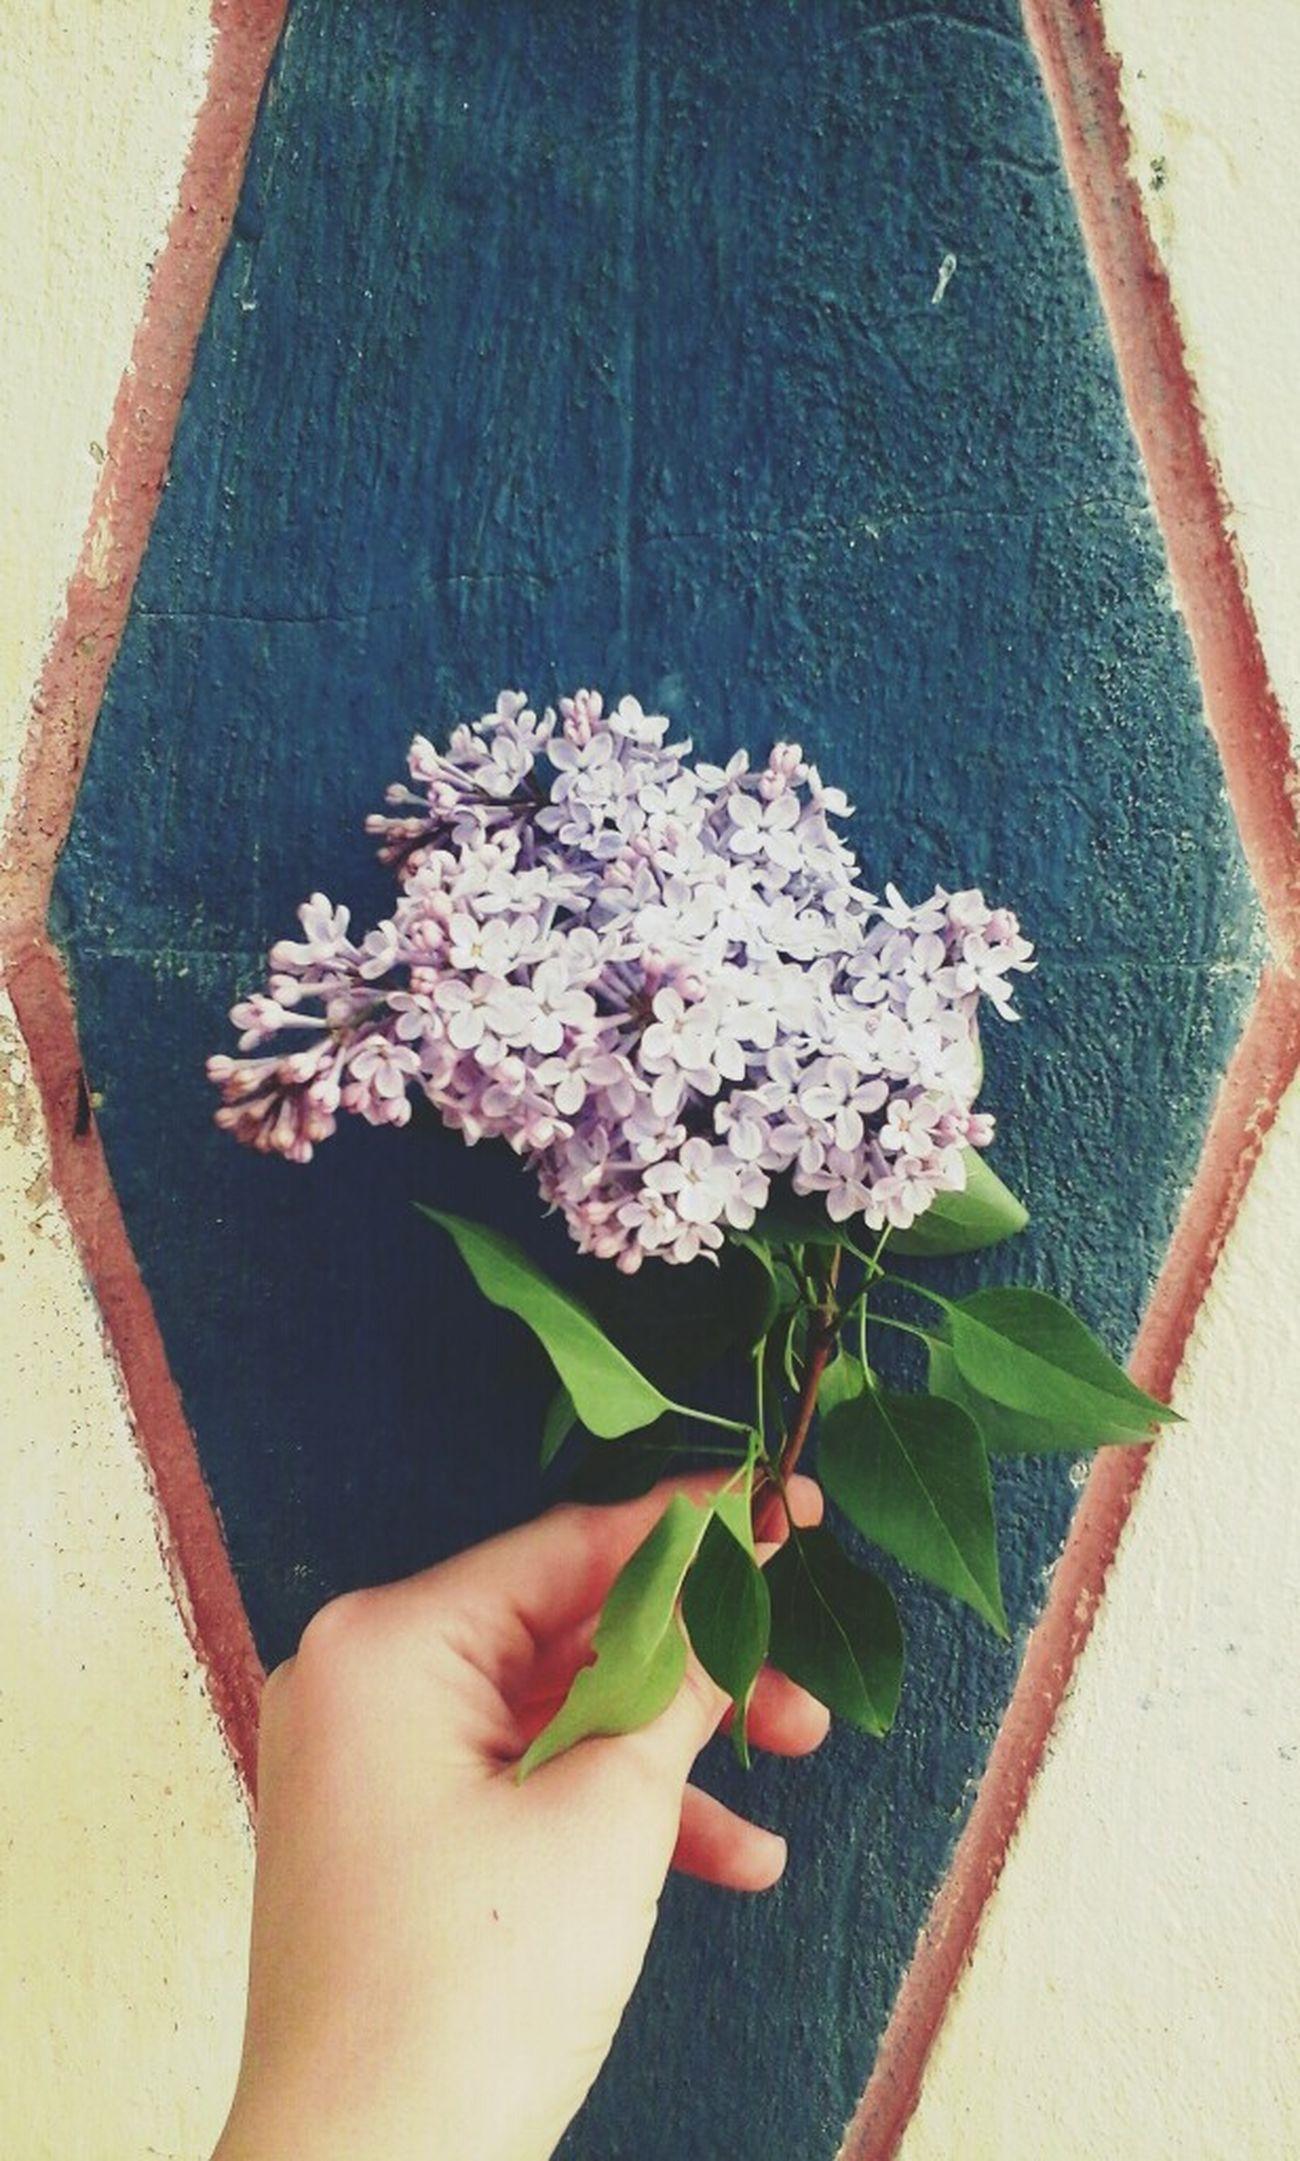 Flower рука сирень цветок  фиолетовый фиолетовый цветок Light Arm солнцесветит☺☀🌞 House стена Весна💐🌷🌿 весна2017 Веснаааа